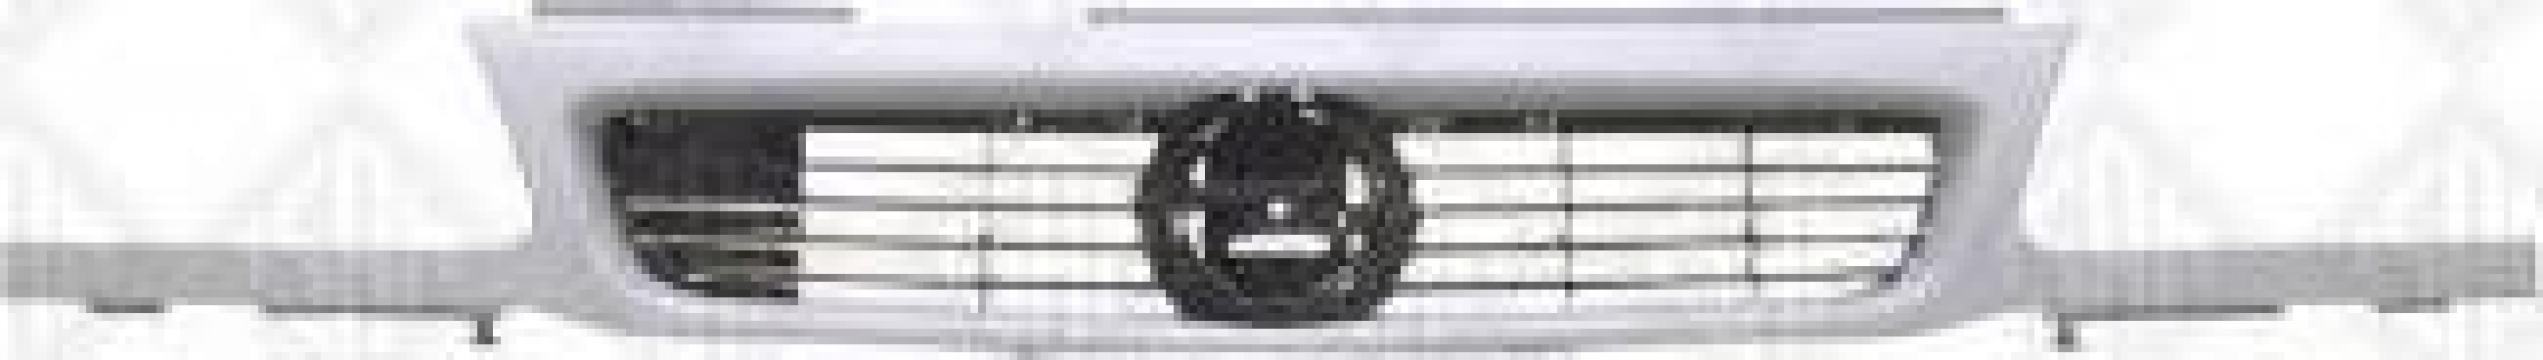 Grila masca fata Opel Astra F de la Alex & Bea Auto Group Srl